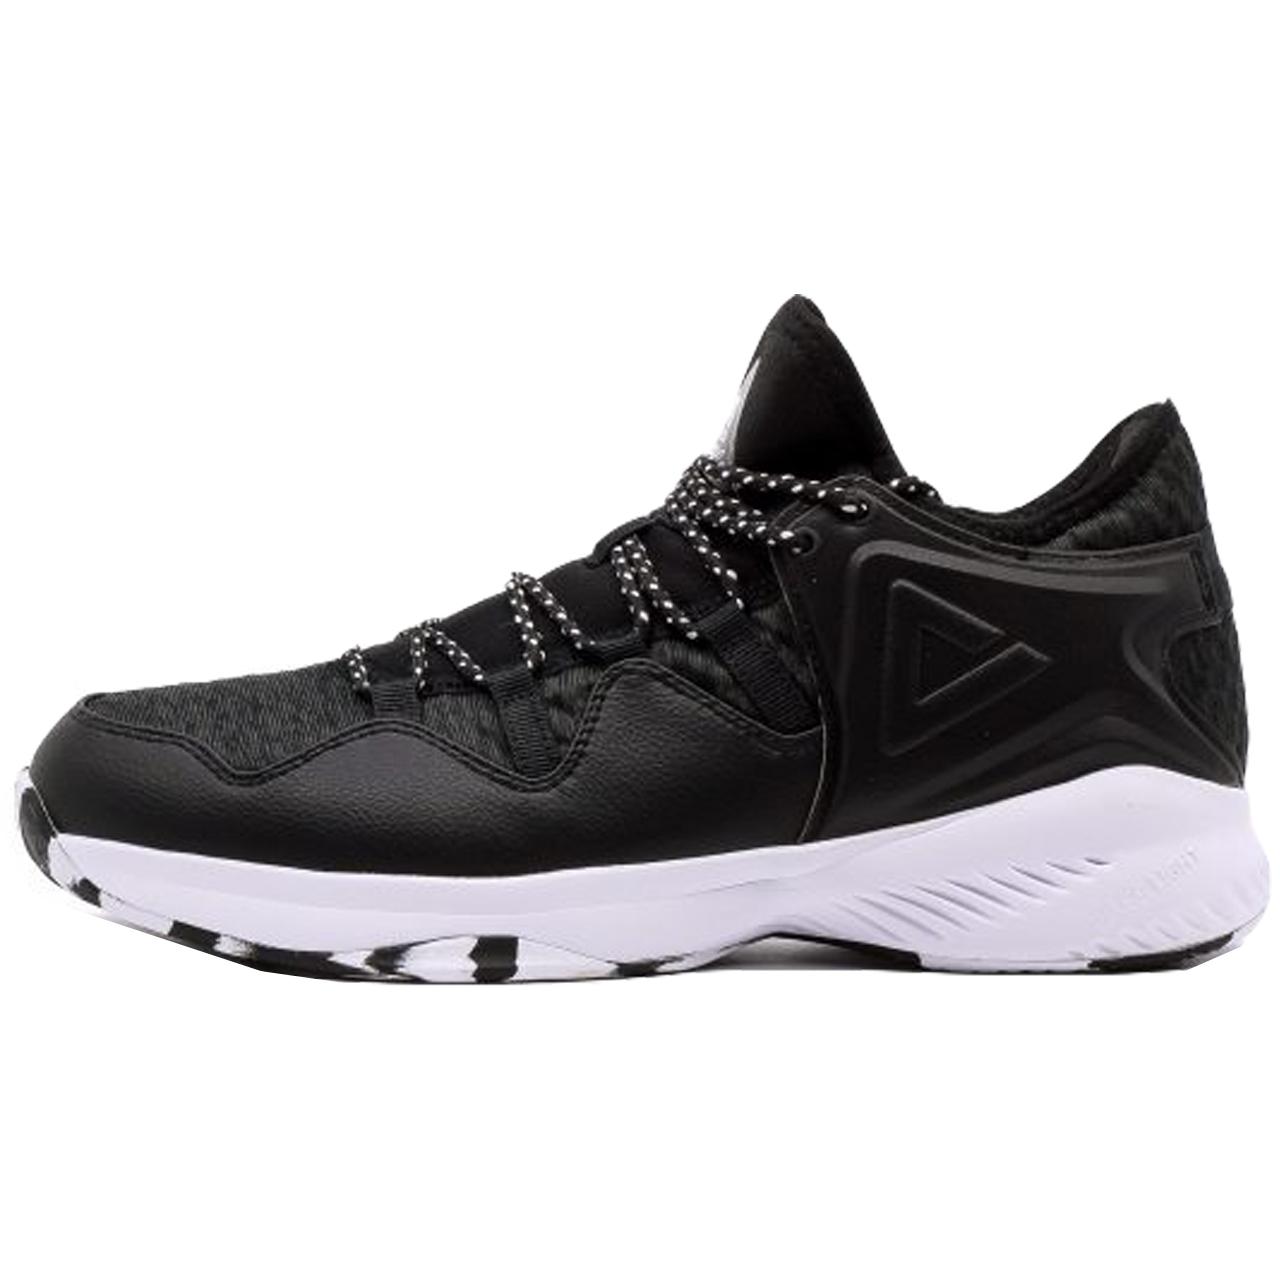 قیمت کفش بسکتبال مردانه پیک مدل  E83001A